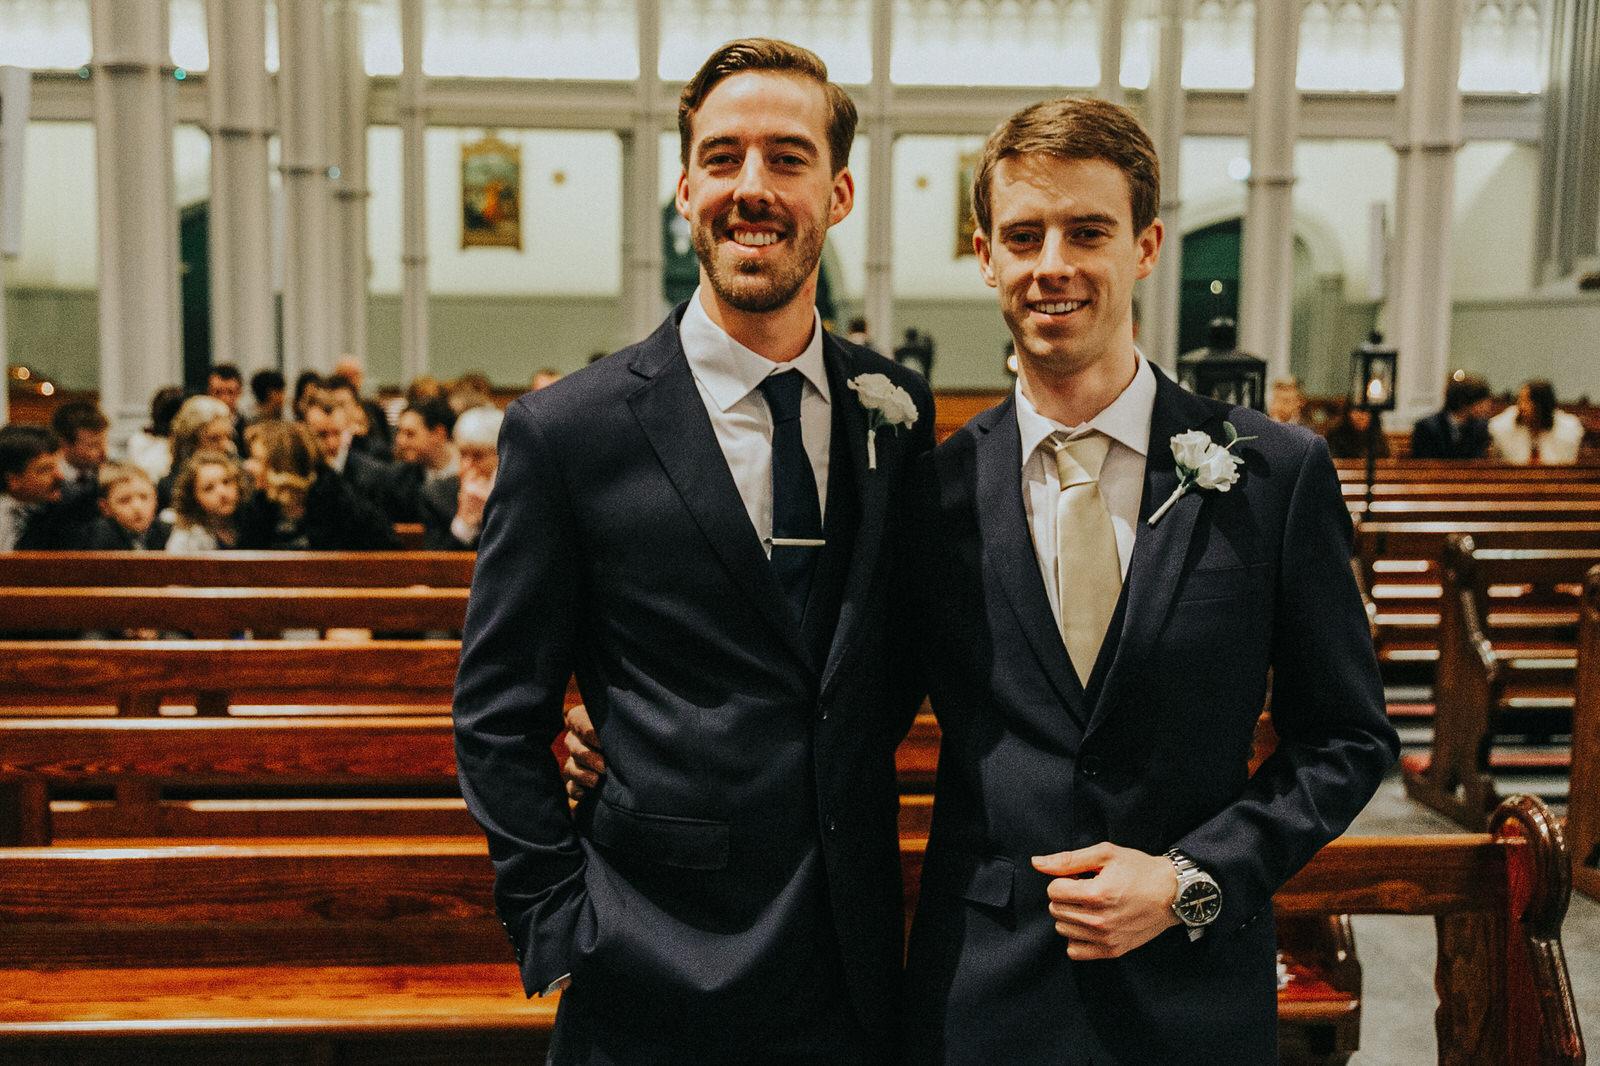 Roger_Kenny_wedding_photographer_424.jpg